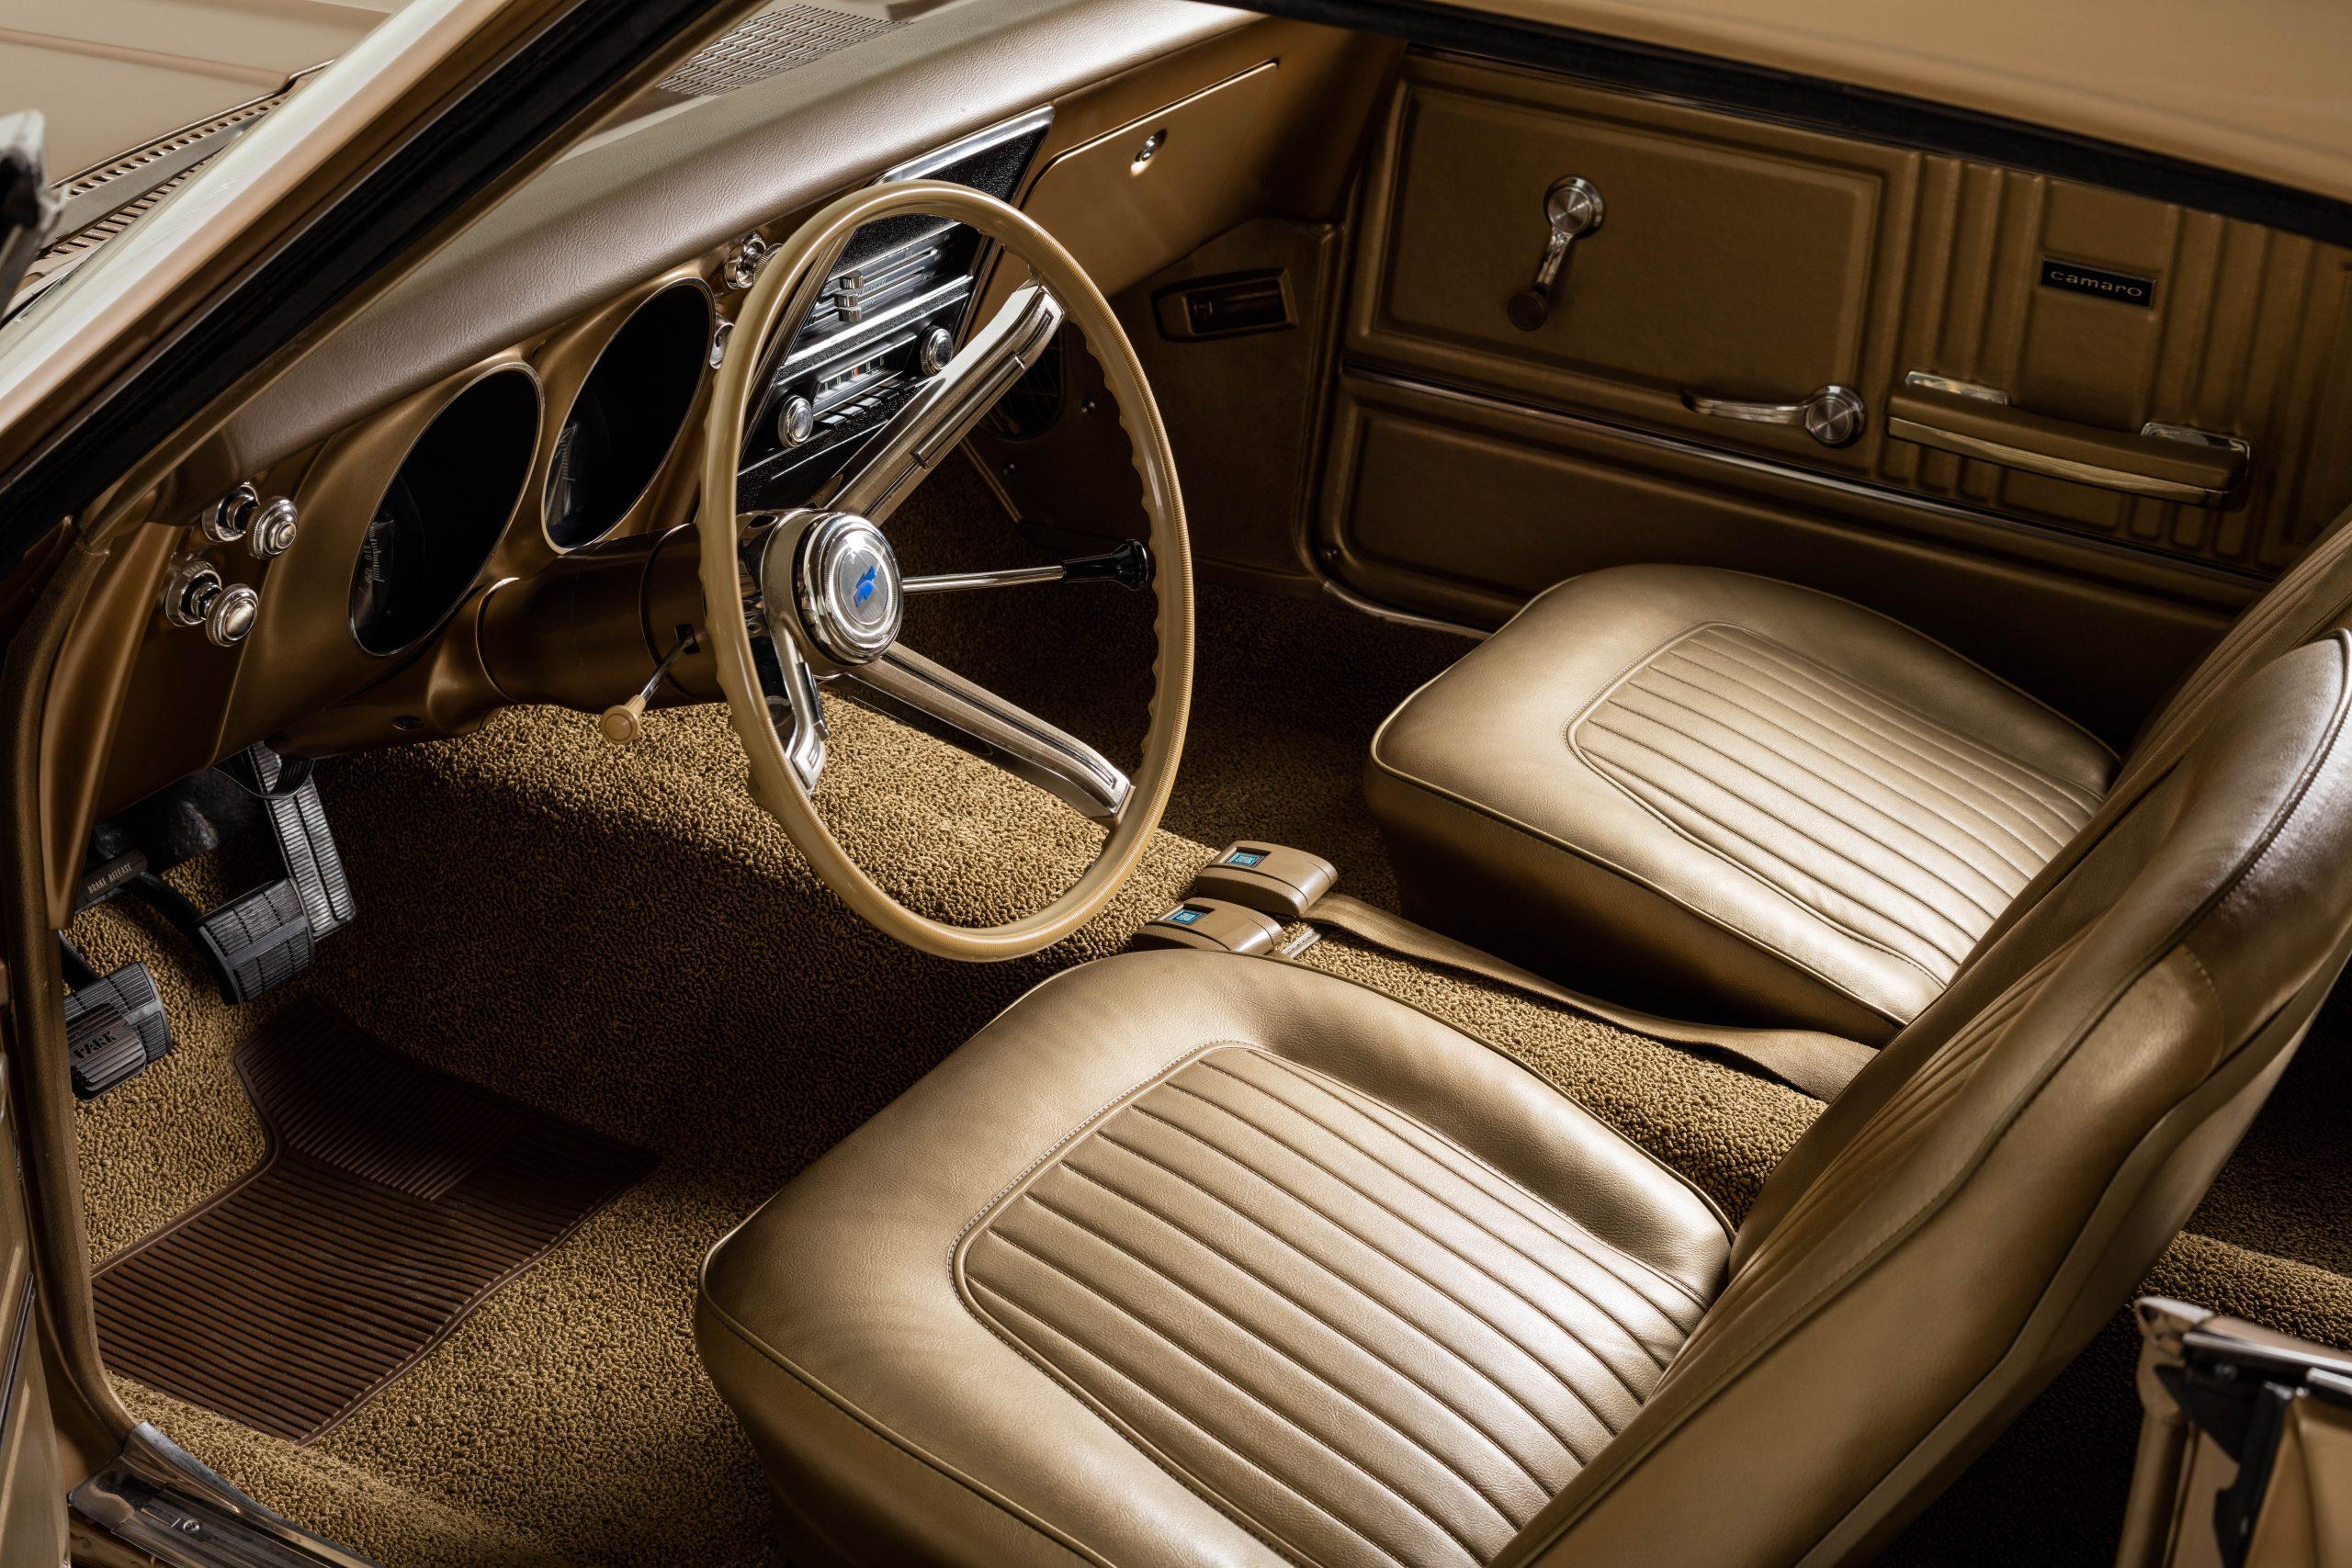 HVA - Chevrolet Camaro N100001 - Interior front bucket seats and steering wheel